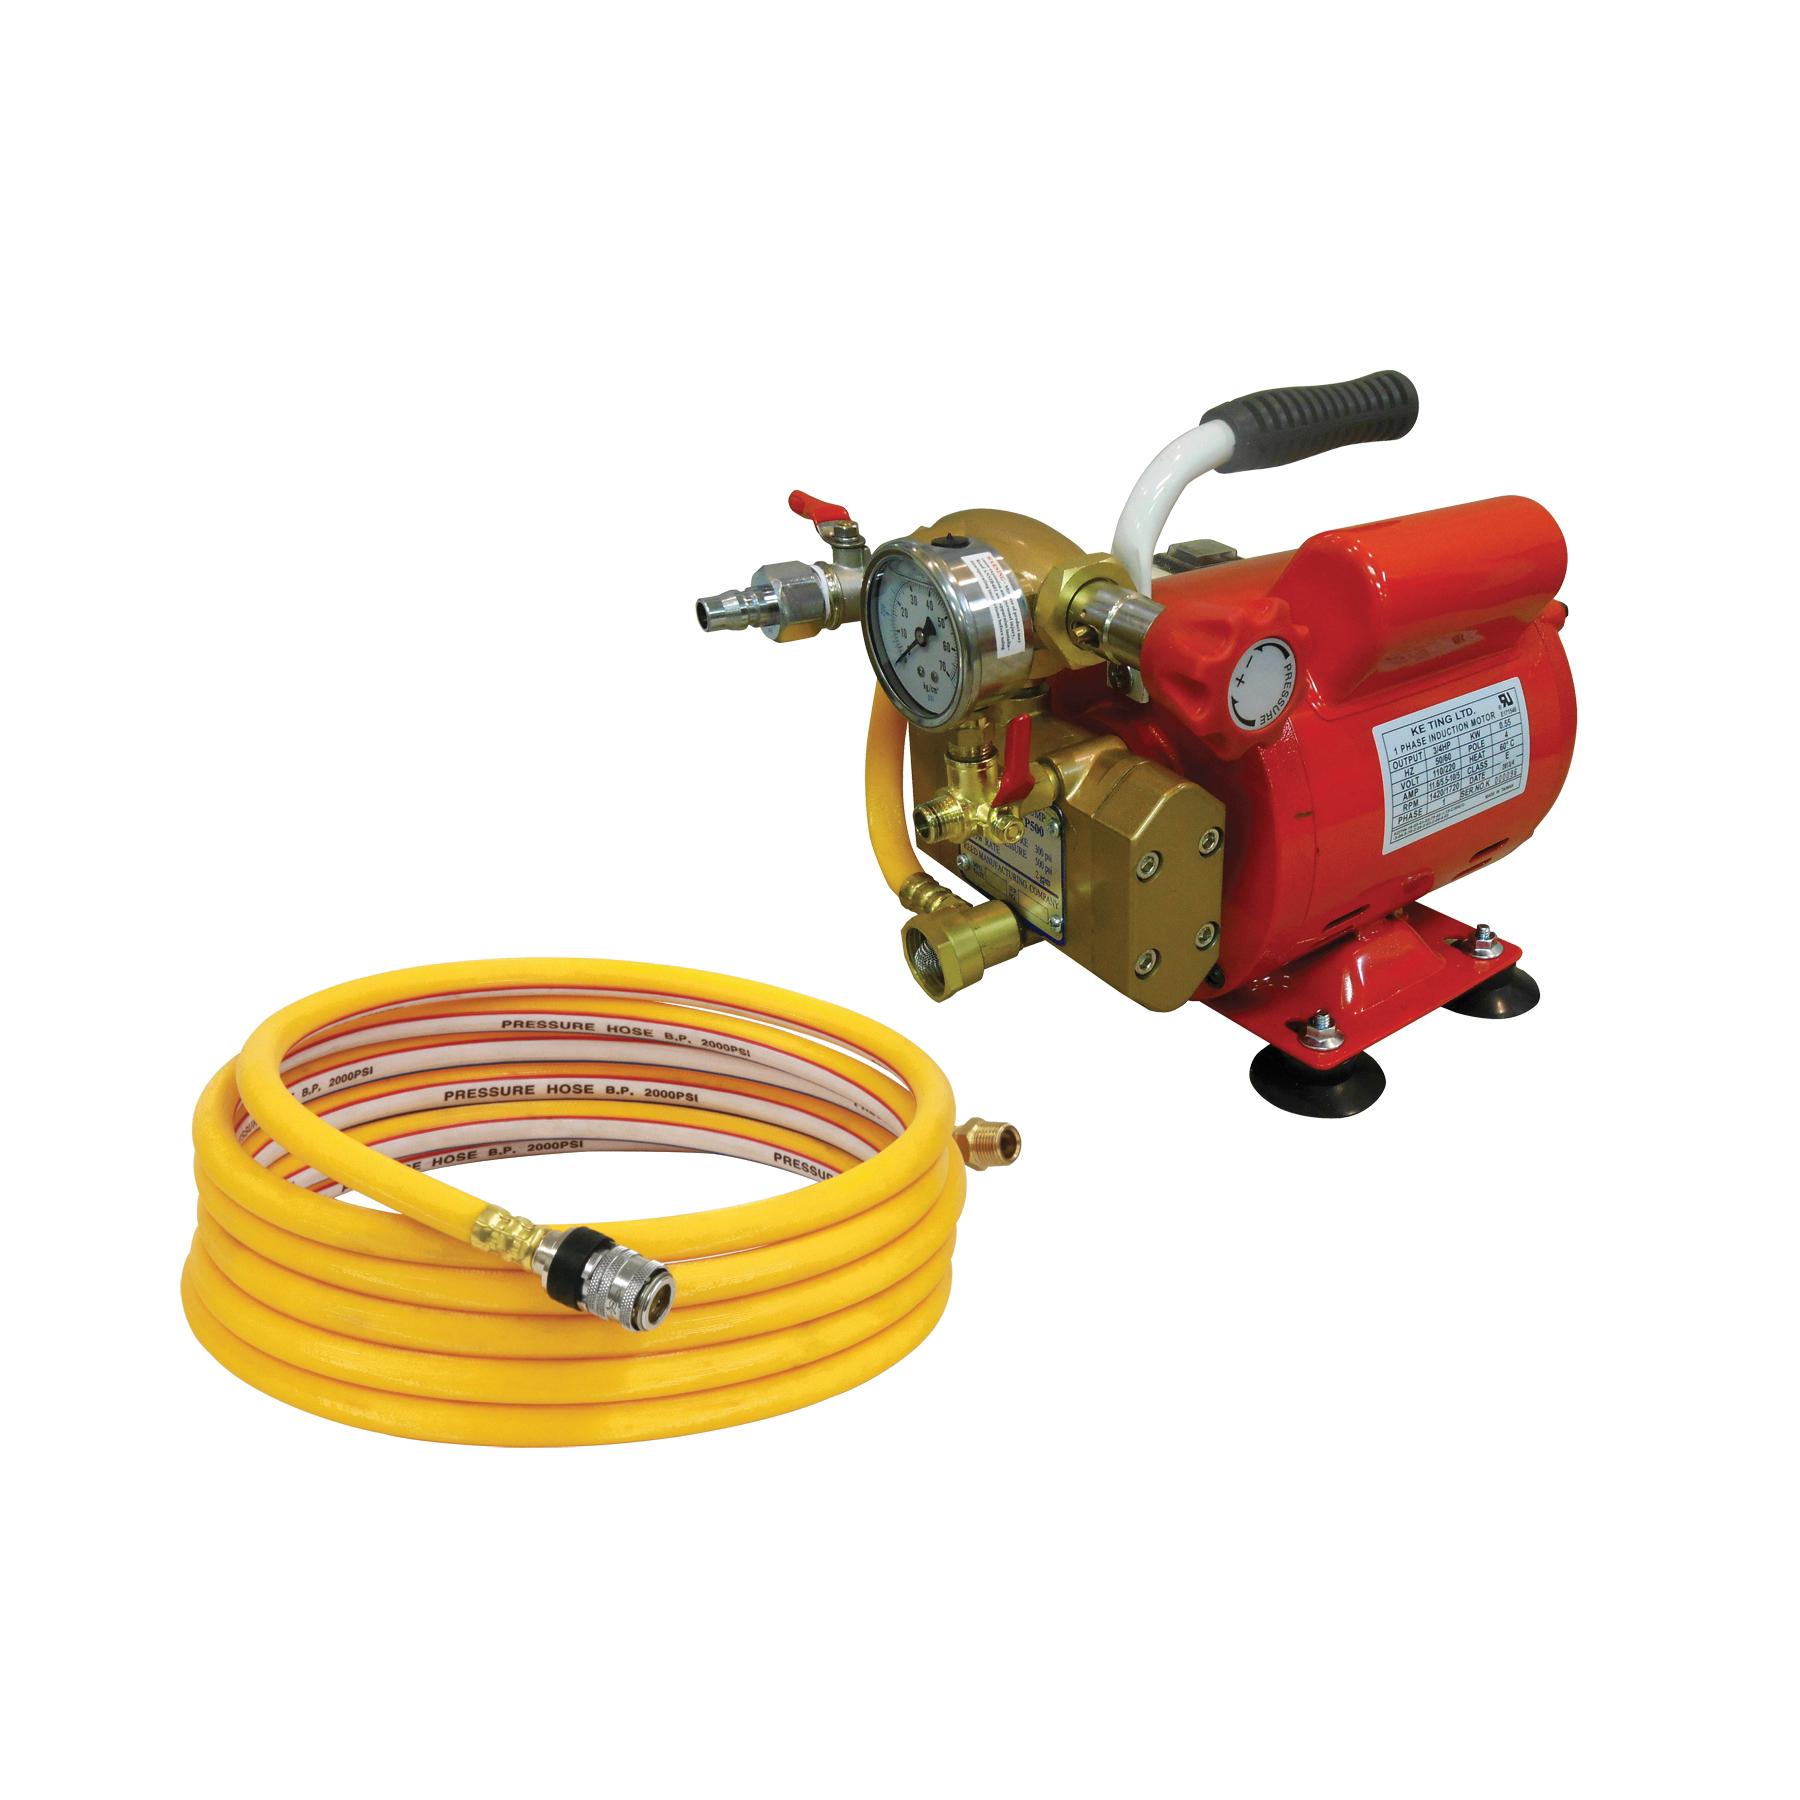 Reed 08170 Electric Hydrostatic Test Pump, 2 gpm, 110 VAC